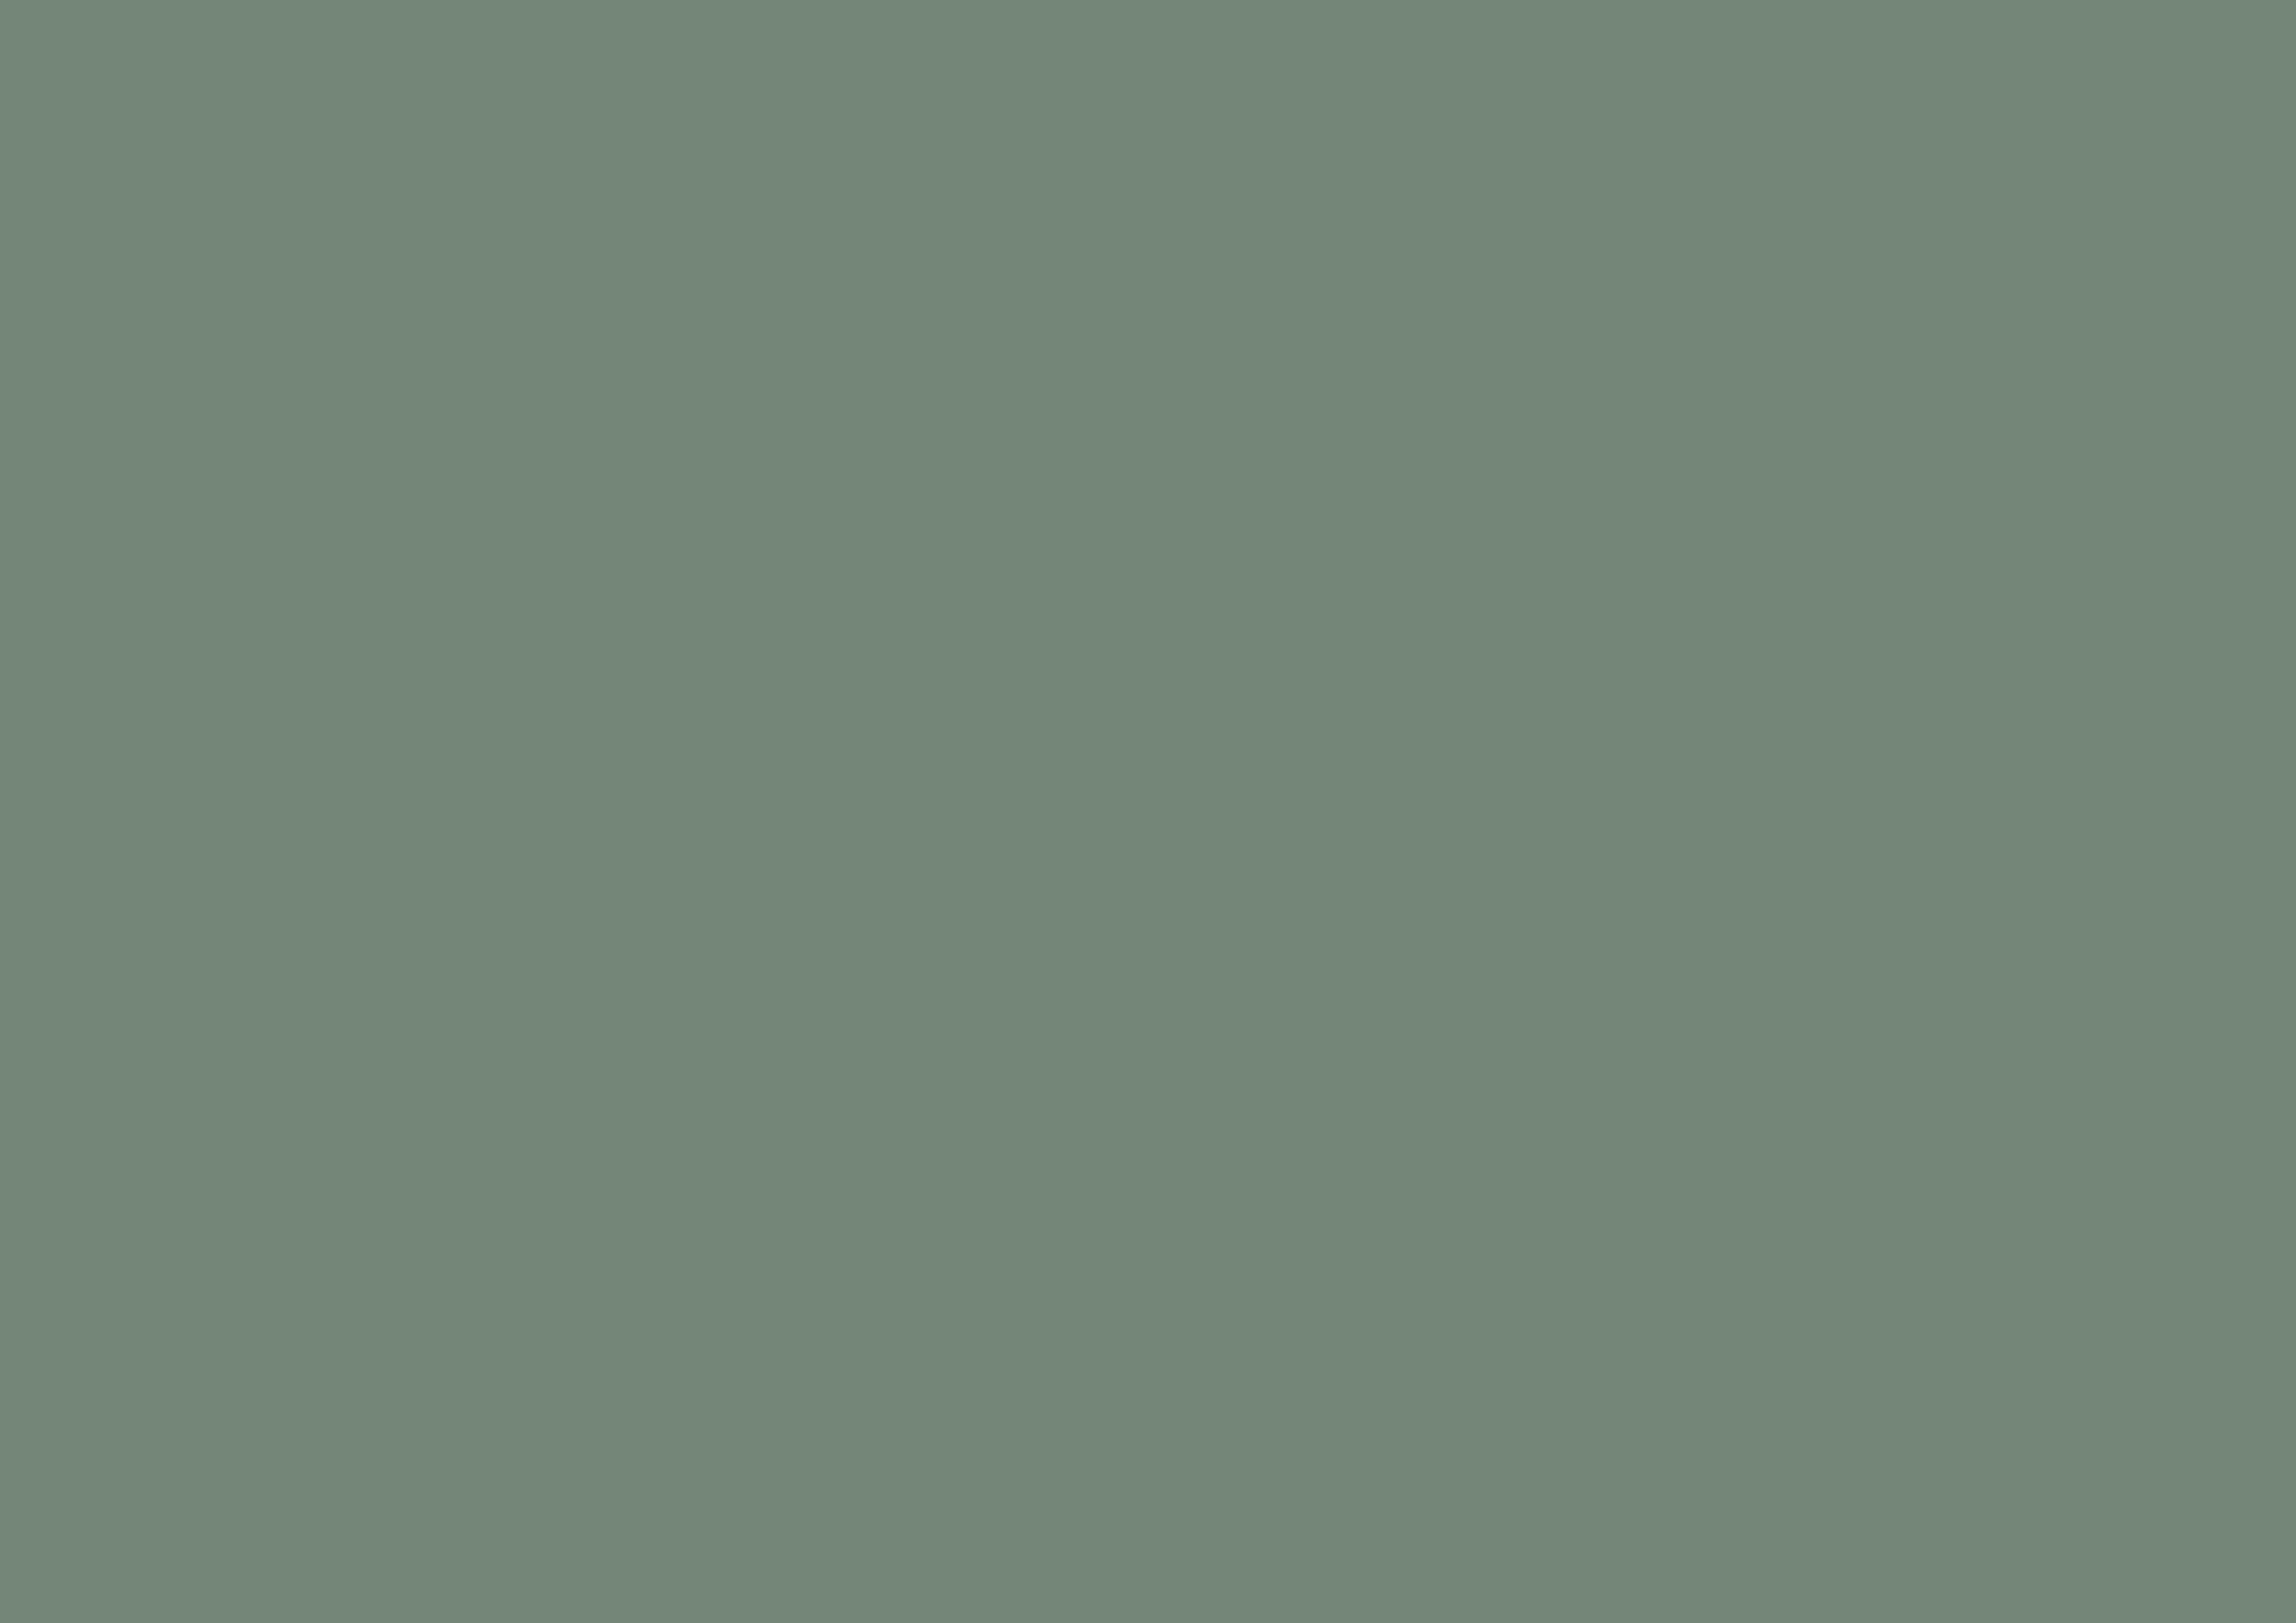 3508x2480 Xanadu Solid Color Background